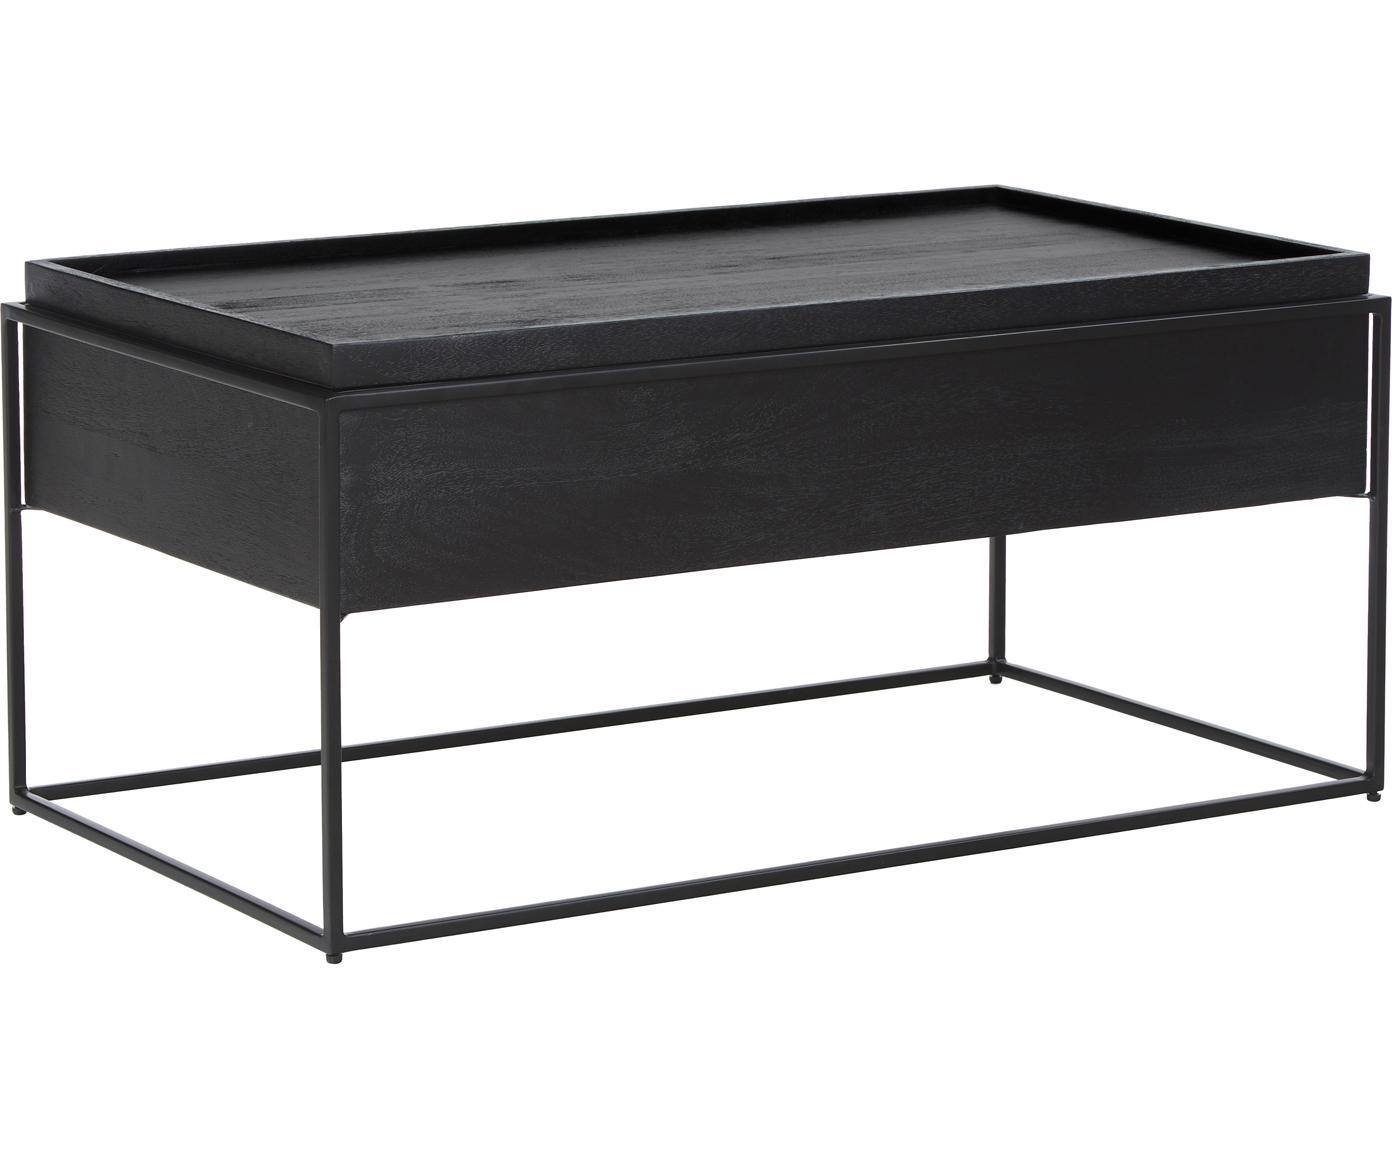 Mesa de centro Theo, con espacio de almacenamiento, Estructura: madera de mango maciza pi, Estructura: metal con pintura en polv, Negro, An 100 x Al 45 cm